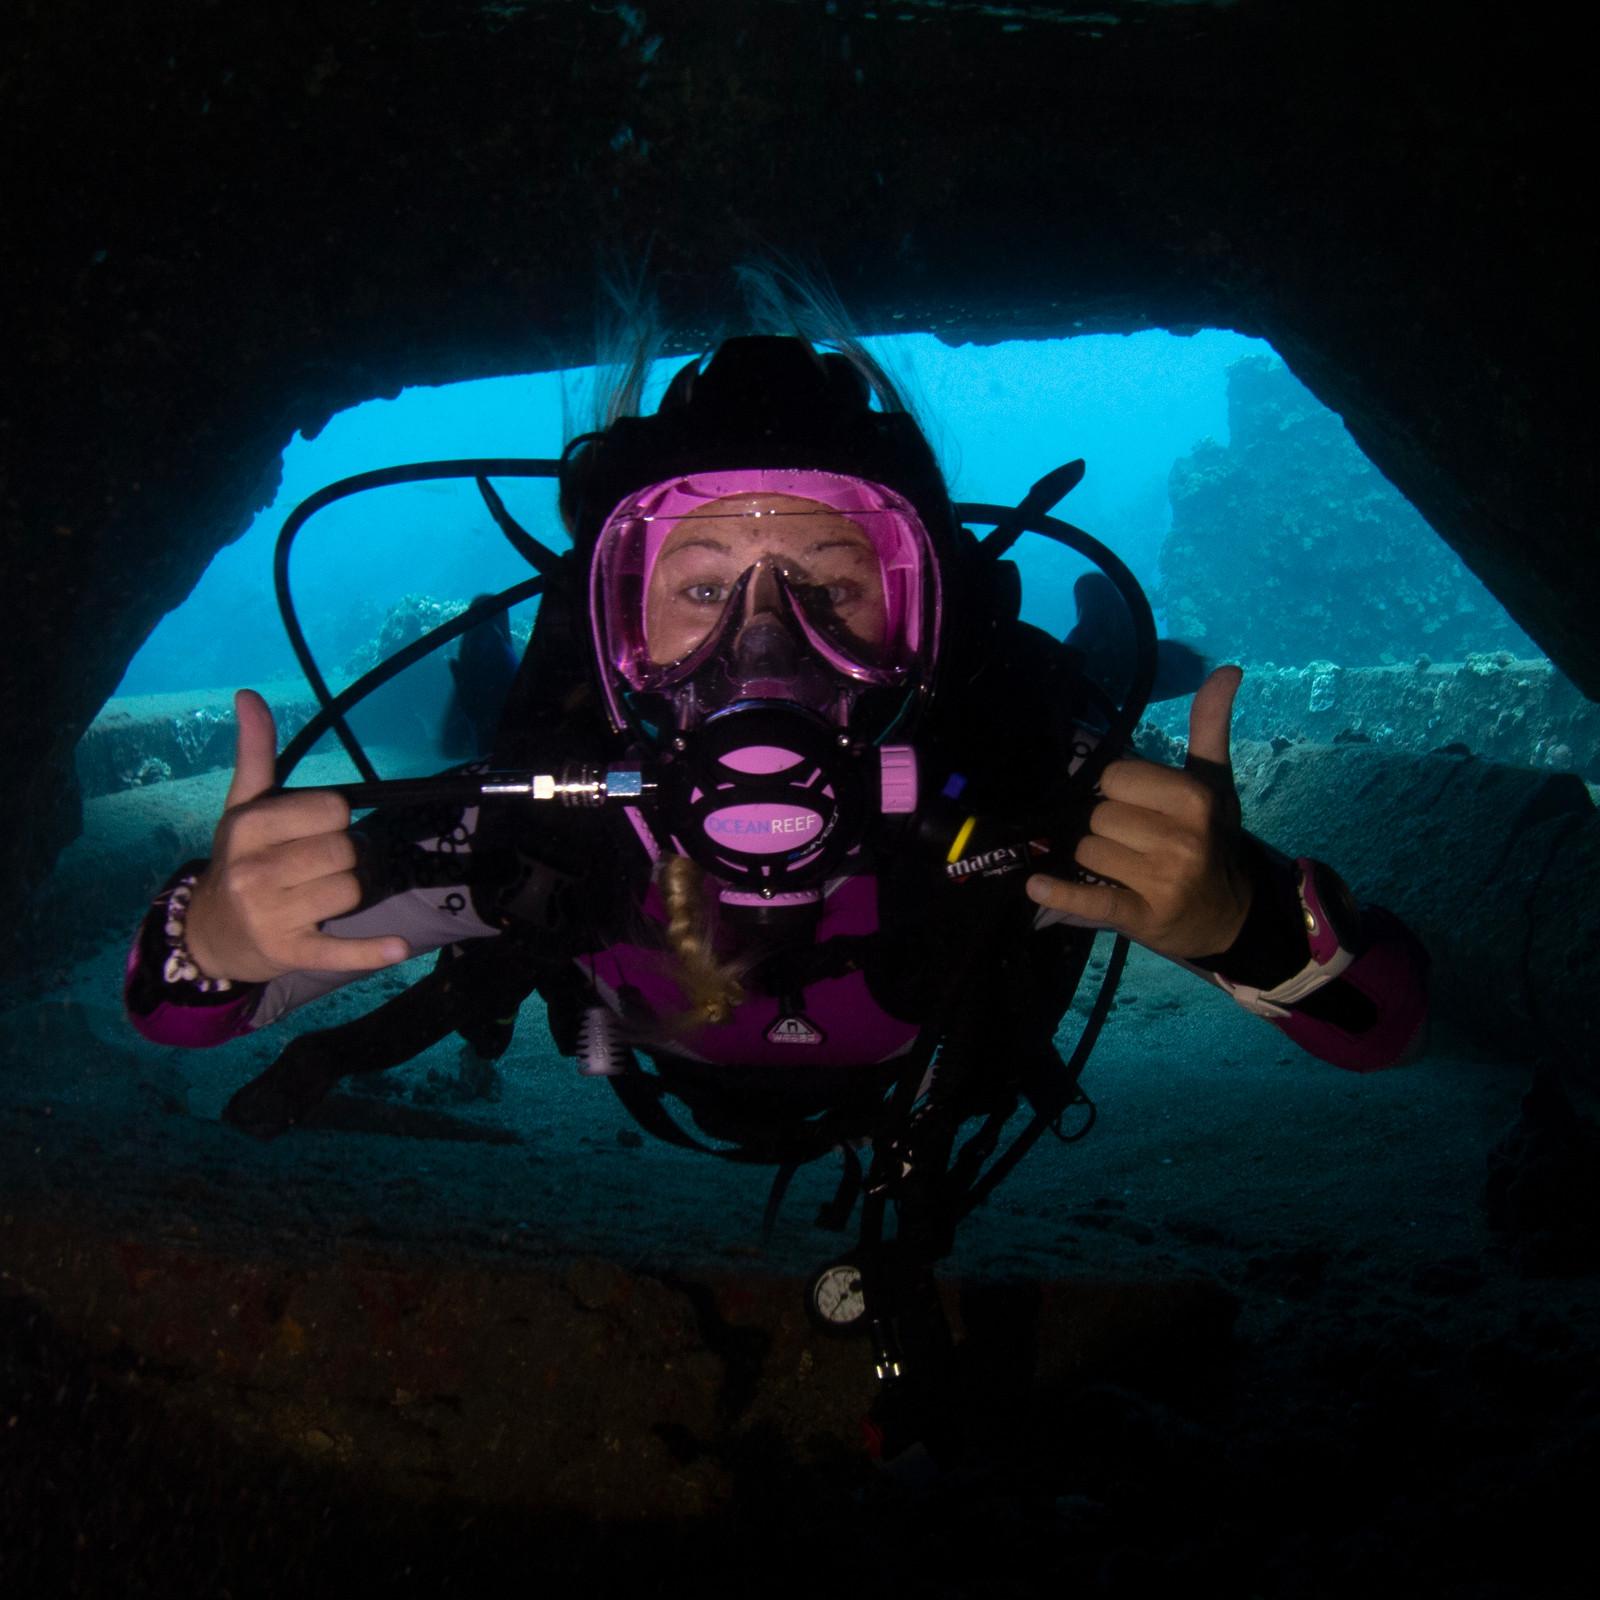 G.divers Full Face Scuba Mask - White